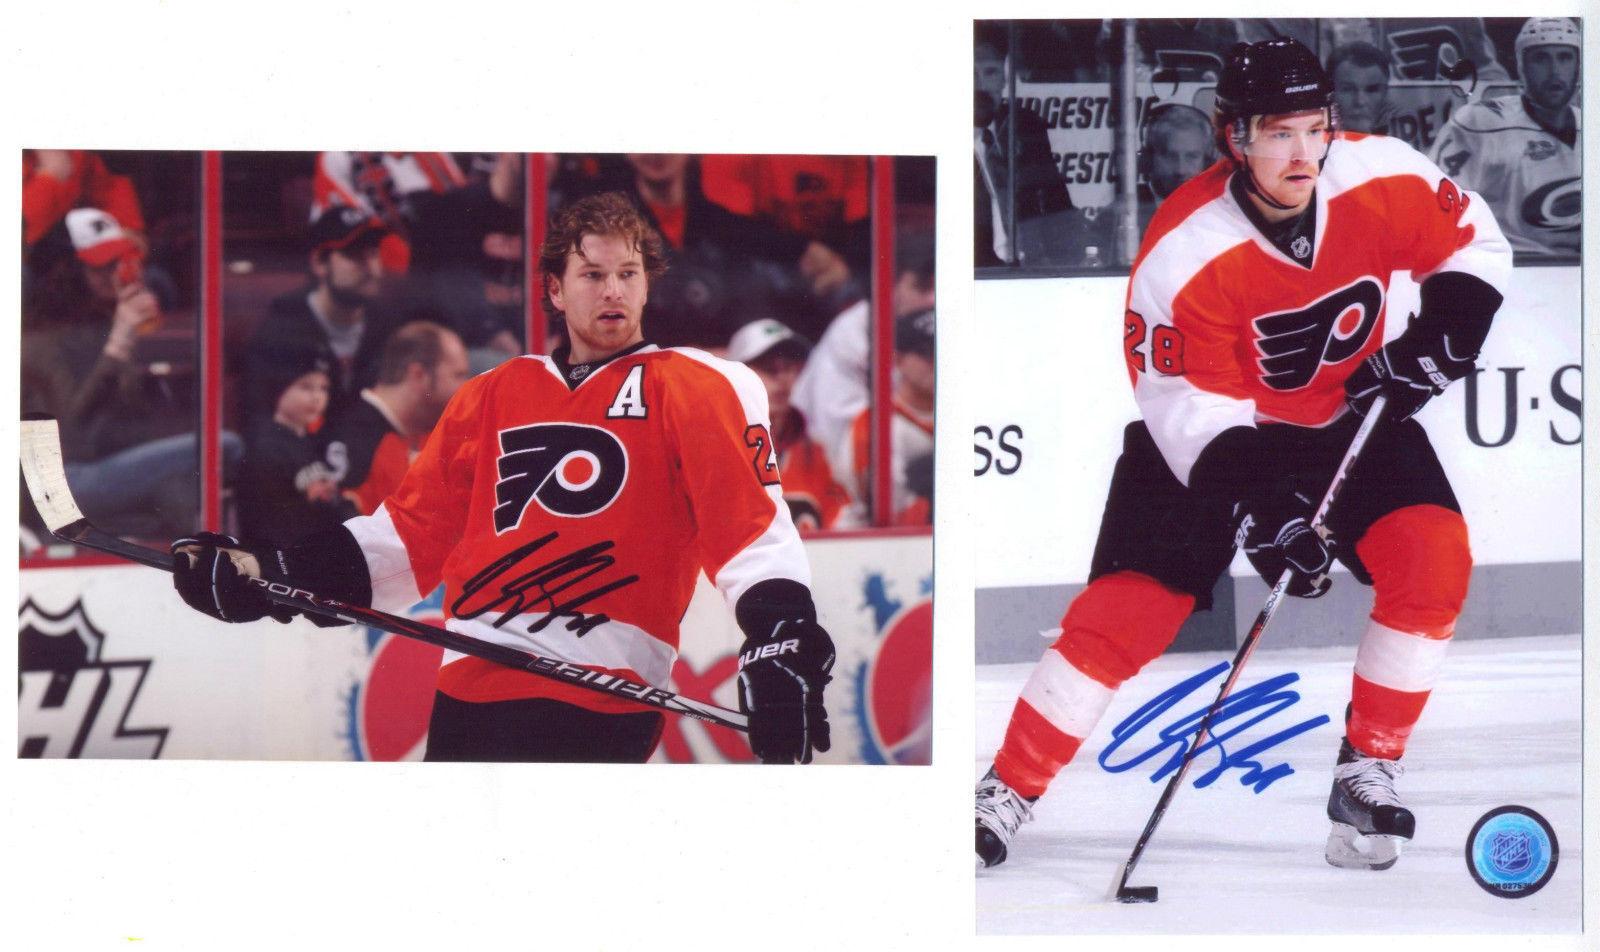 27b66abe5 Claude Giroux Philadelphia Flyers 2 PHOTOS SET 4x6 signed REPRINT  autographed